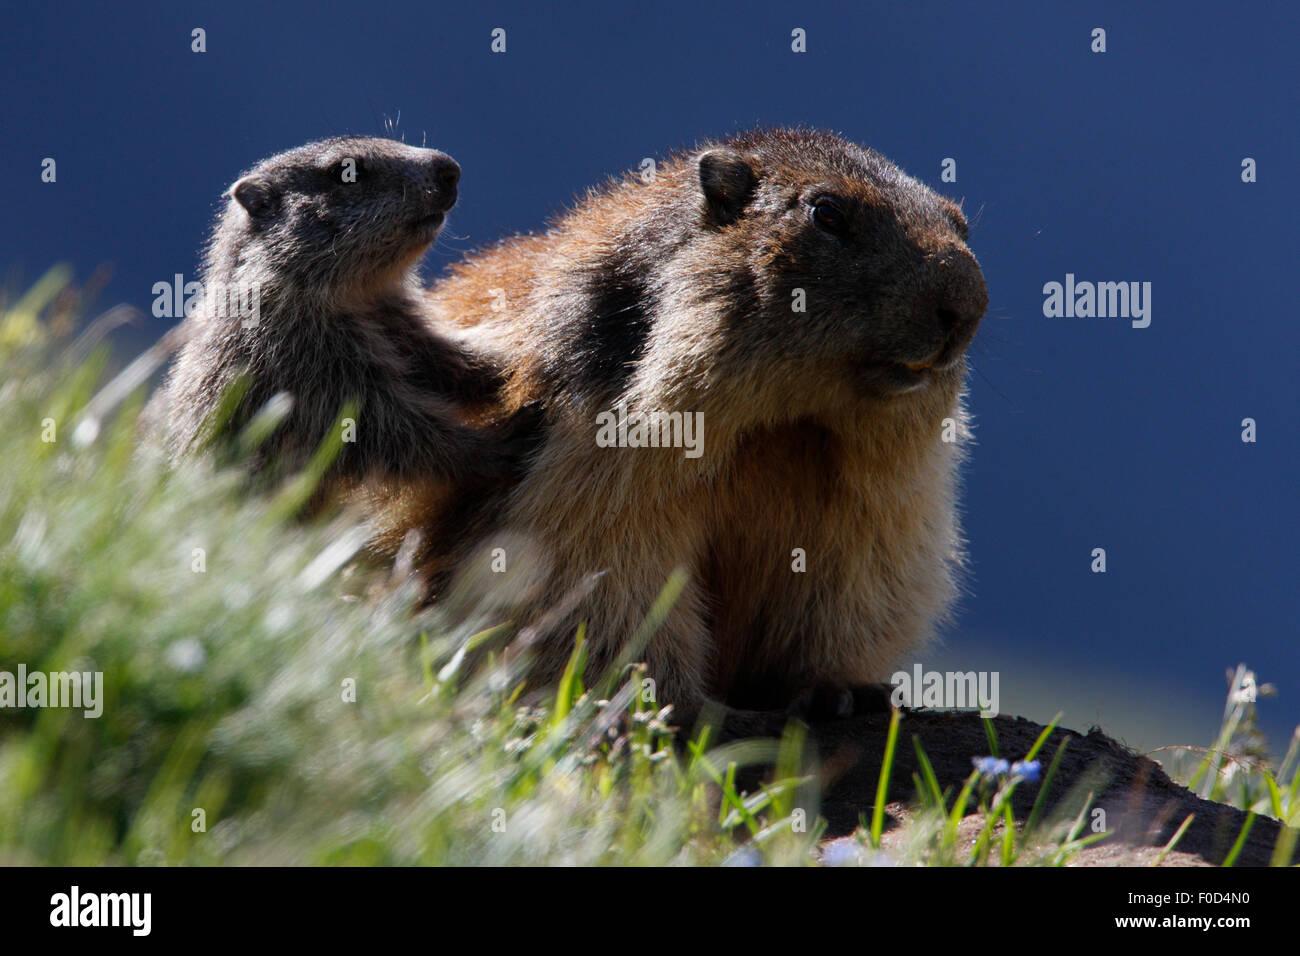 Alpine marmot (Marmota marmota) adult with young, Hohe Tauern National Park, Austria, July 2008 - Stock Image